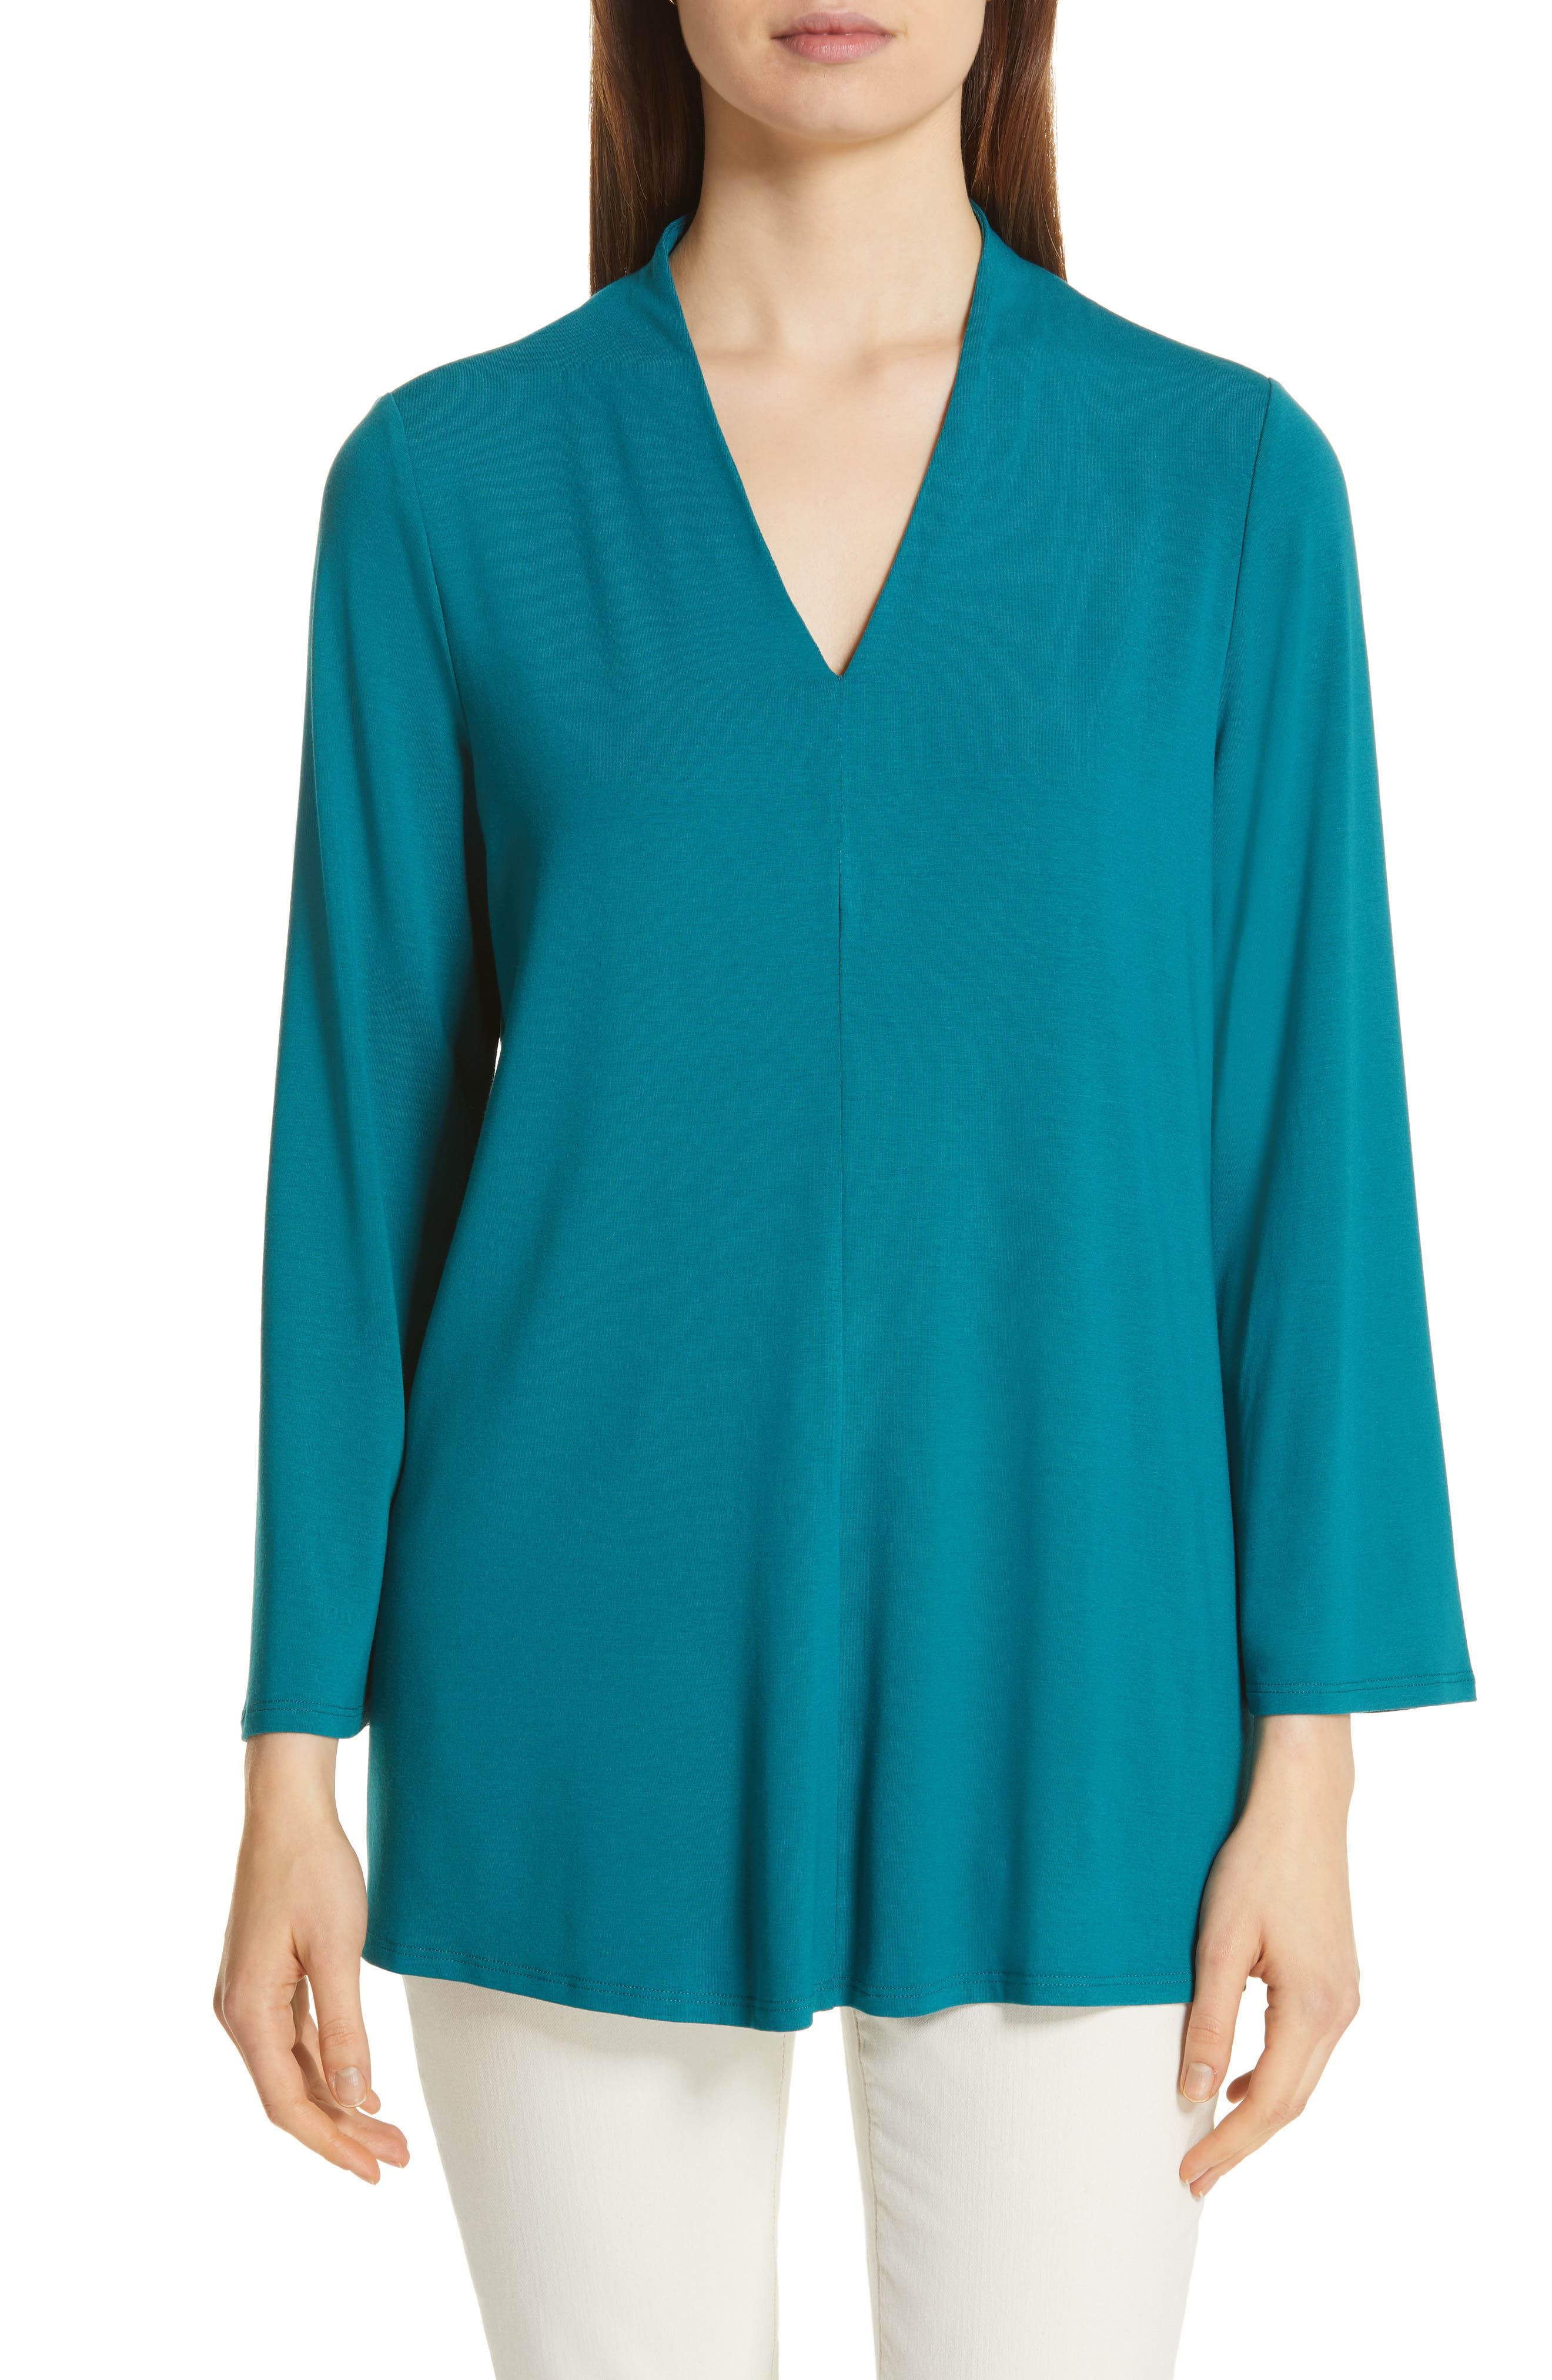 Eileen Fisher V-Neck Top, Blue/green